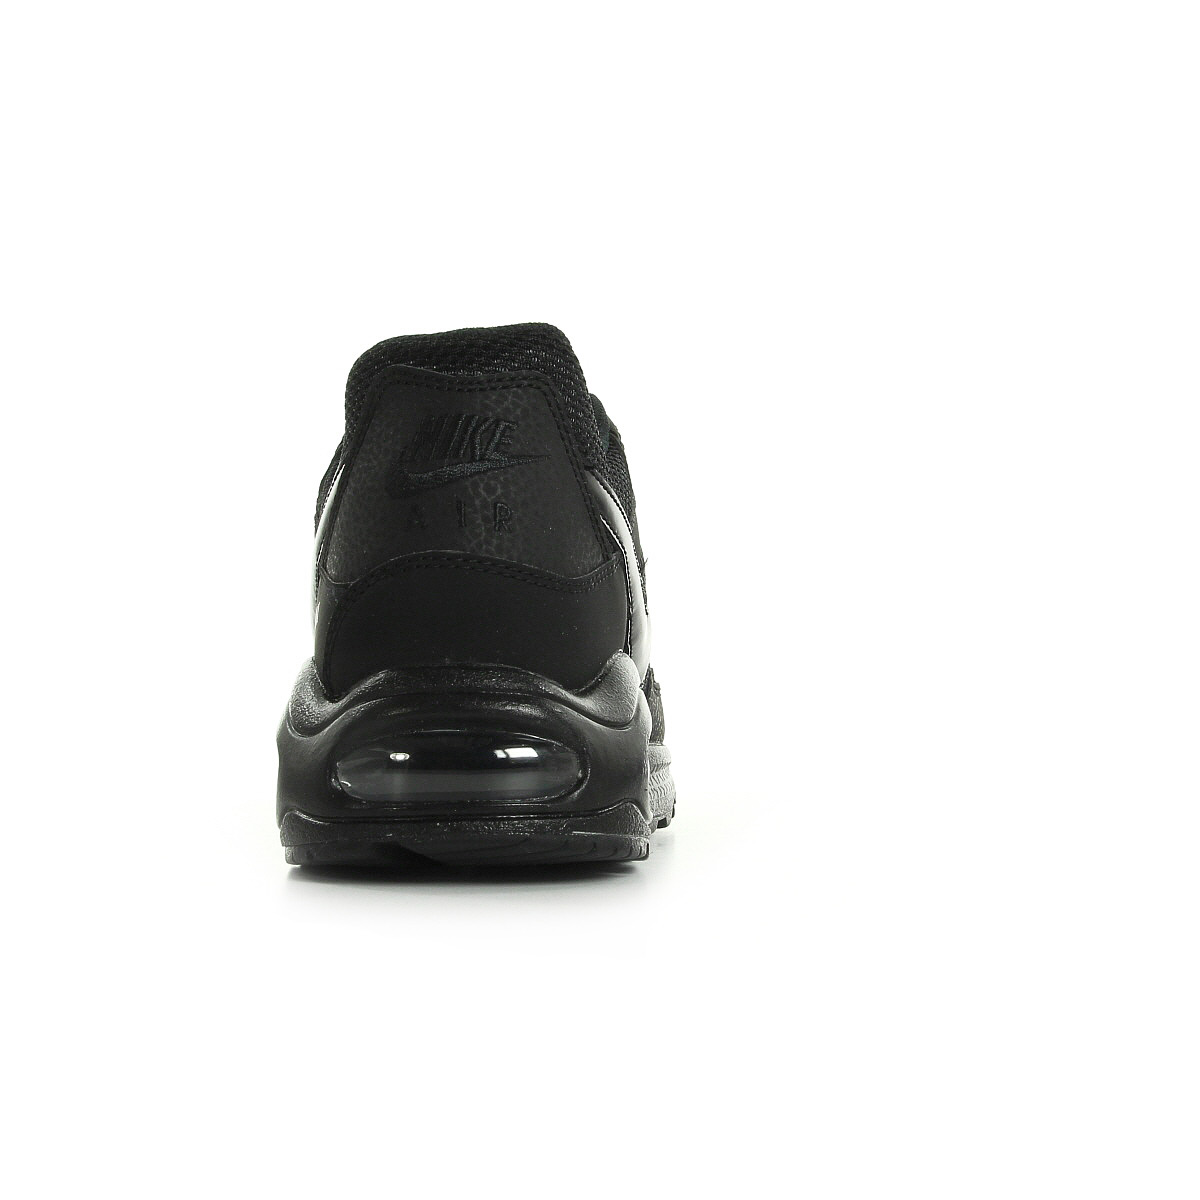 Nike Air Max Command GS 407759090, Basket 38.5 EU